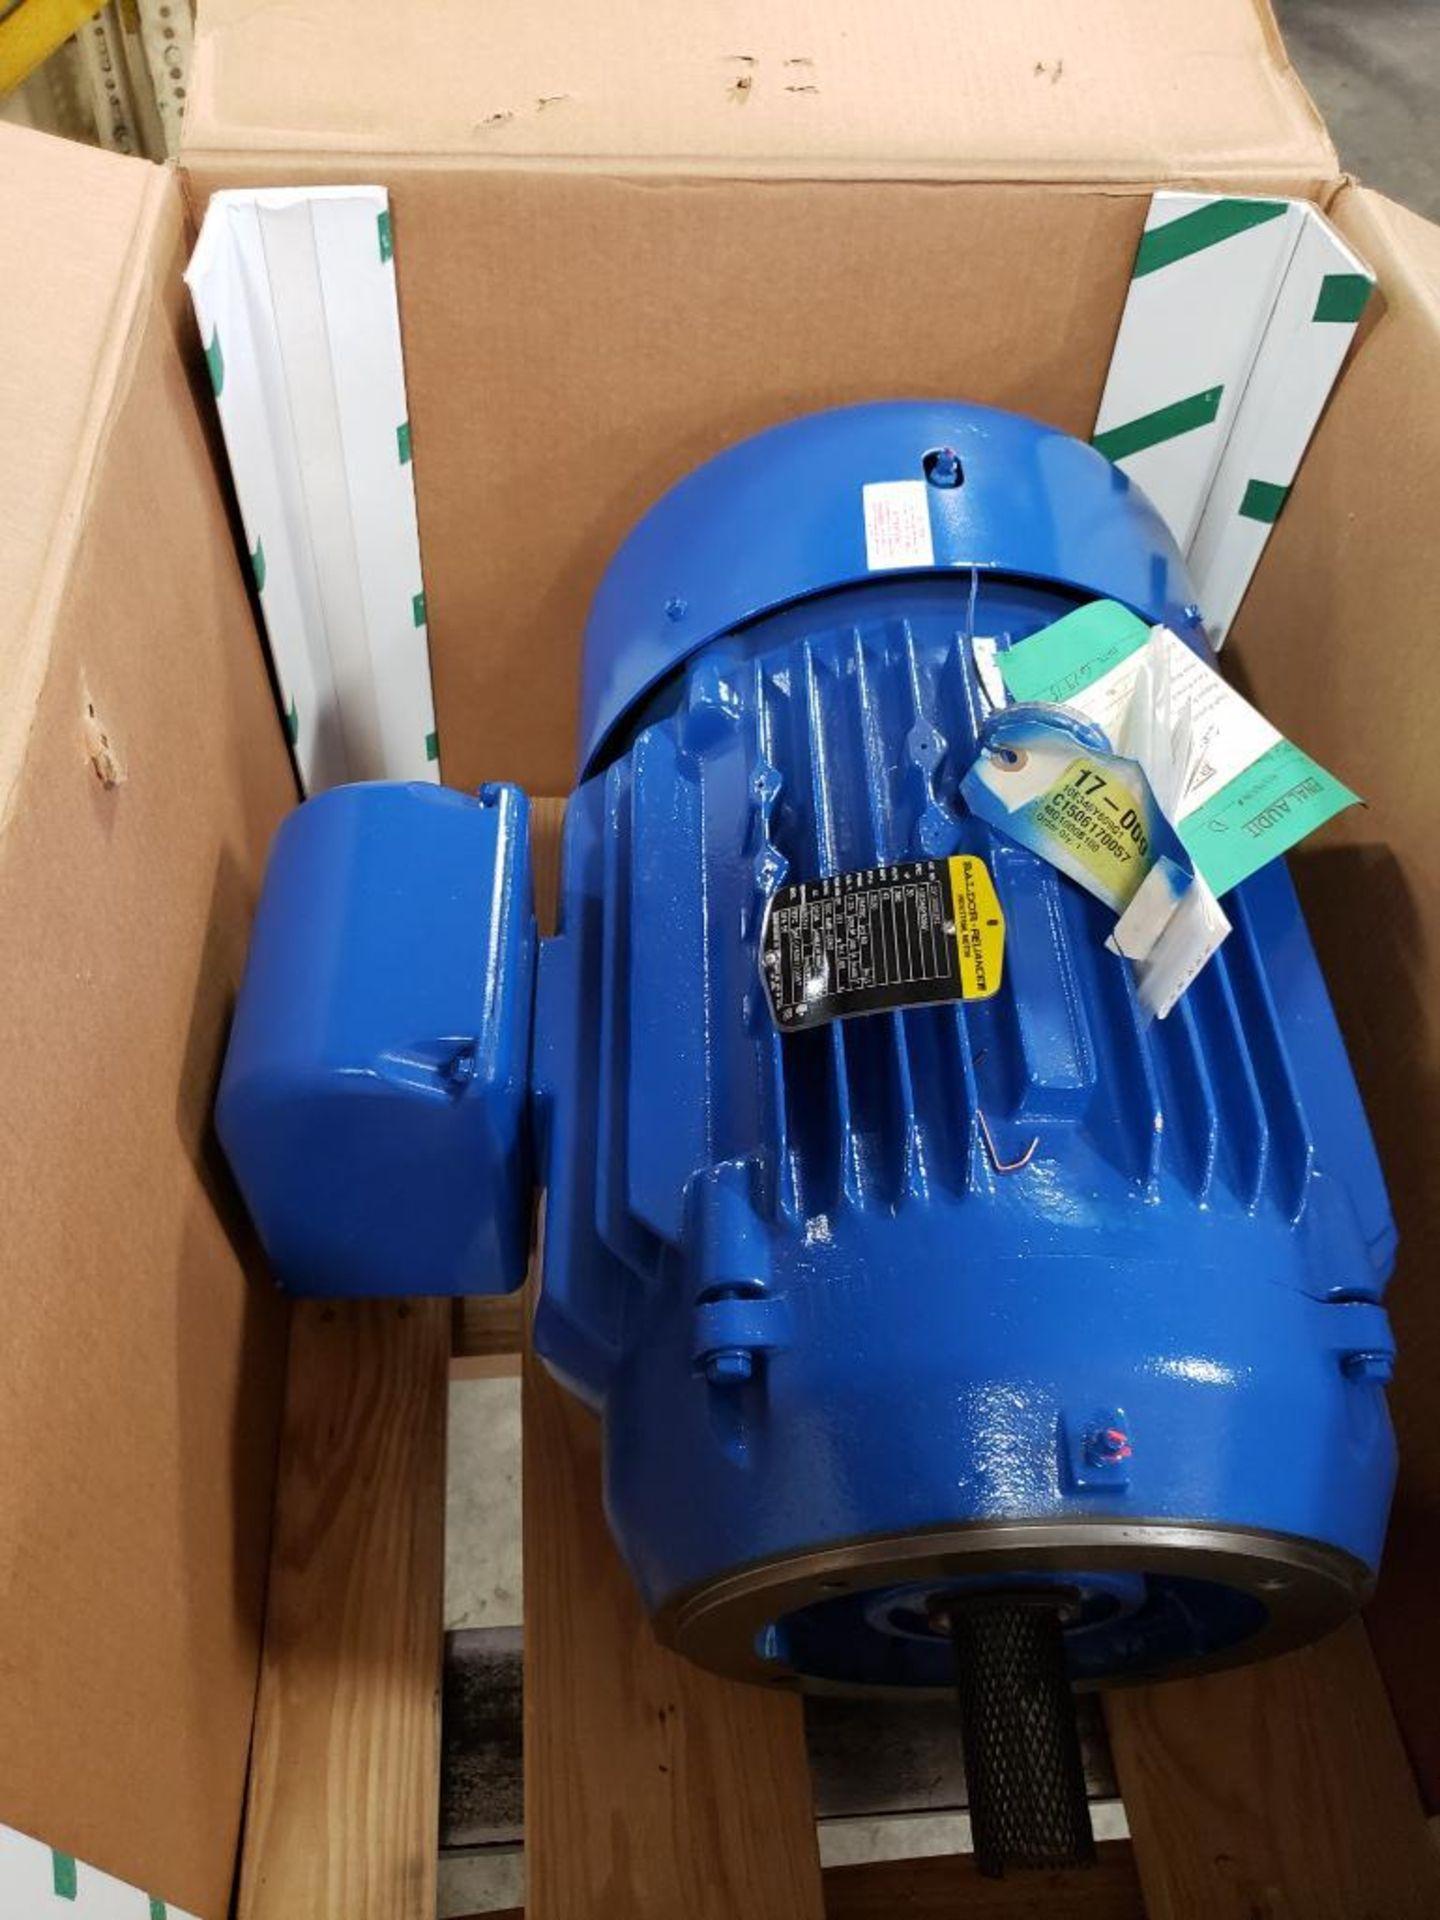 30HP Baldor Reliance 3PH motor. 2013006282. 380V, 3530RPM, 284TSC-Frame.